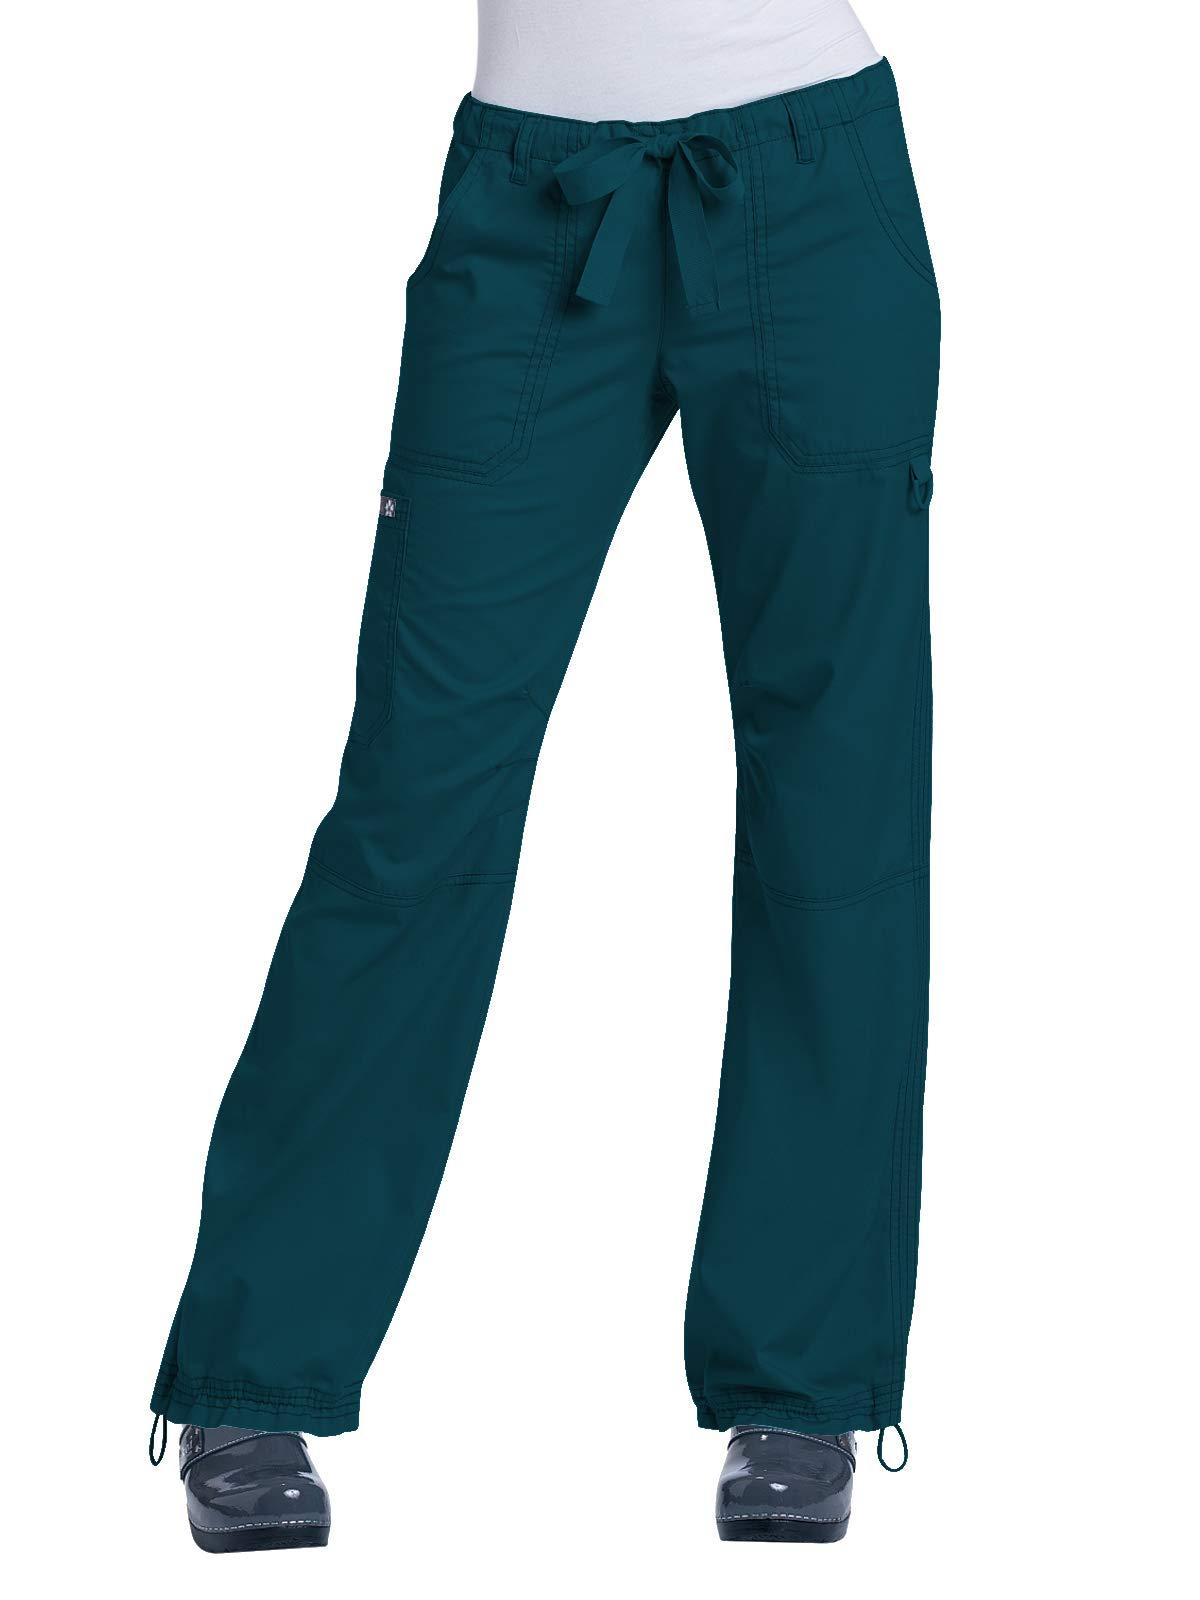 KOI Classics 701 Women's Lindsey Scrub Pant Deep Sea 4XL